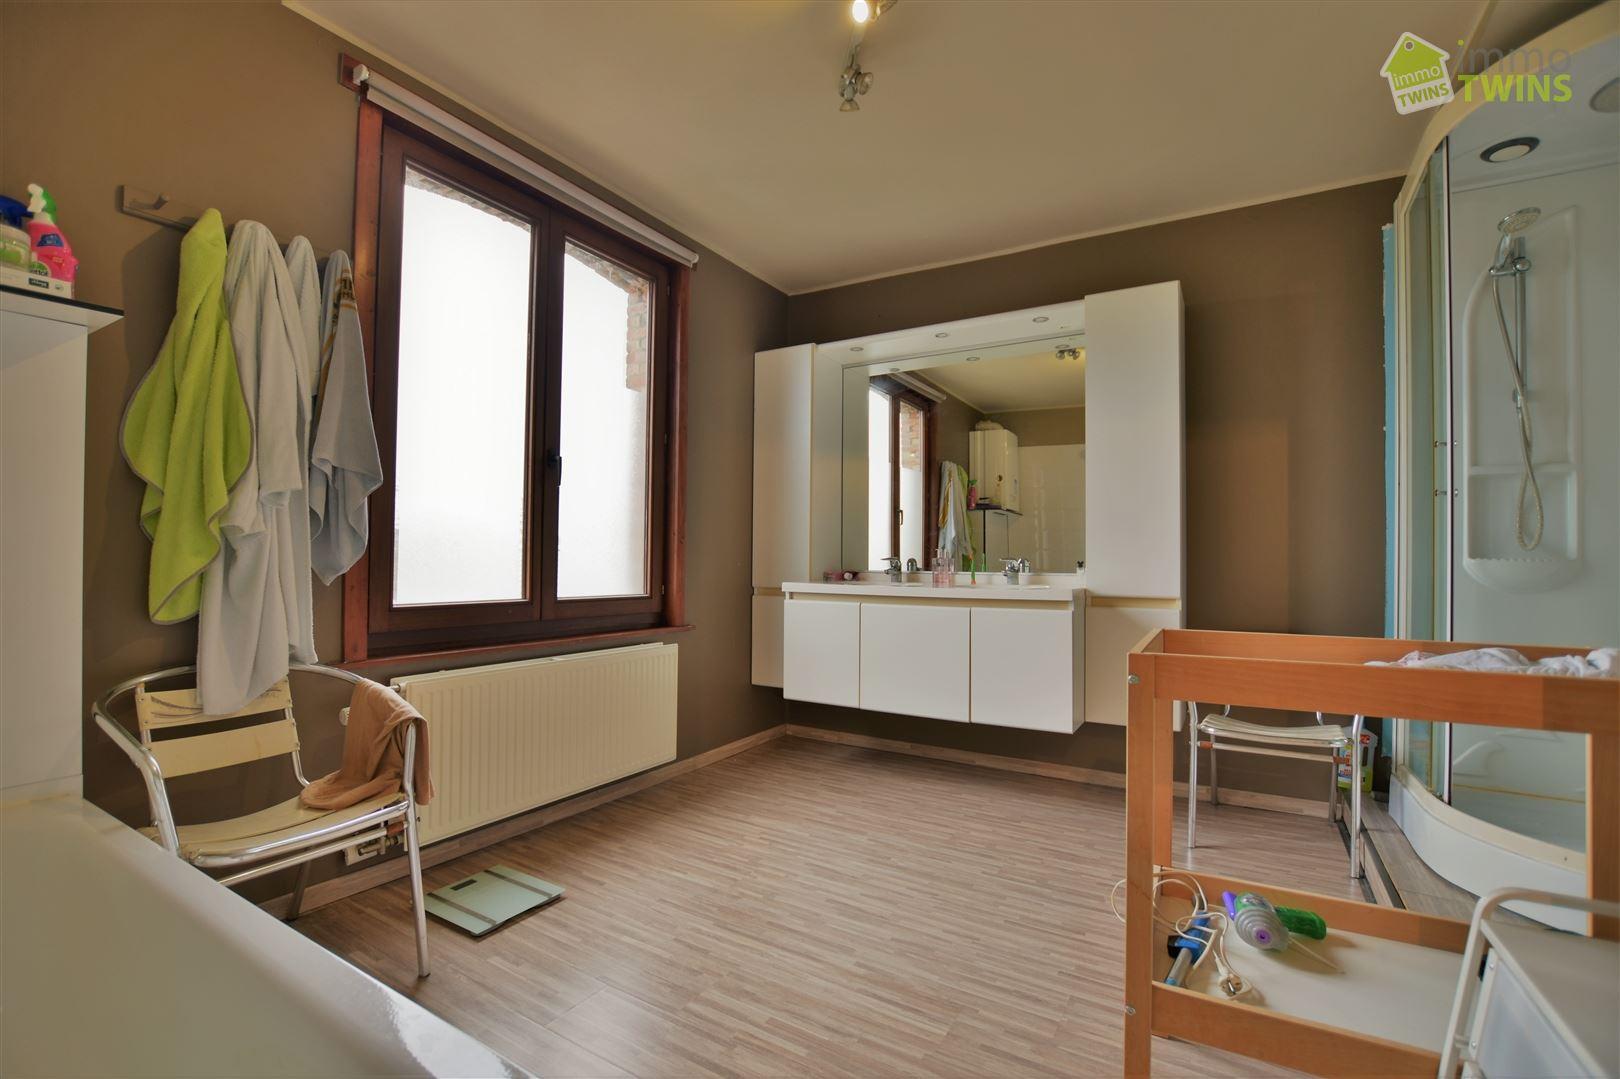 Foto 10 : Woning te 9200 SINT-GILLIS-BIJ-DENDERMONDE (België) - Prijs € 710